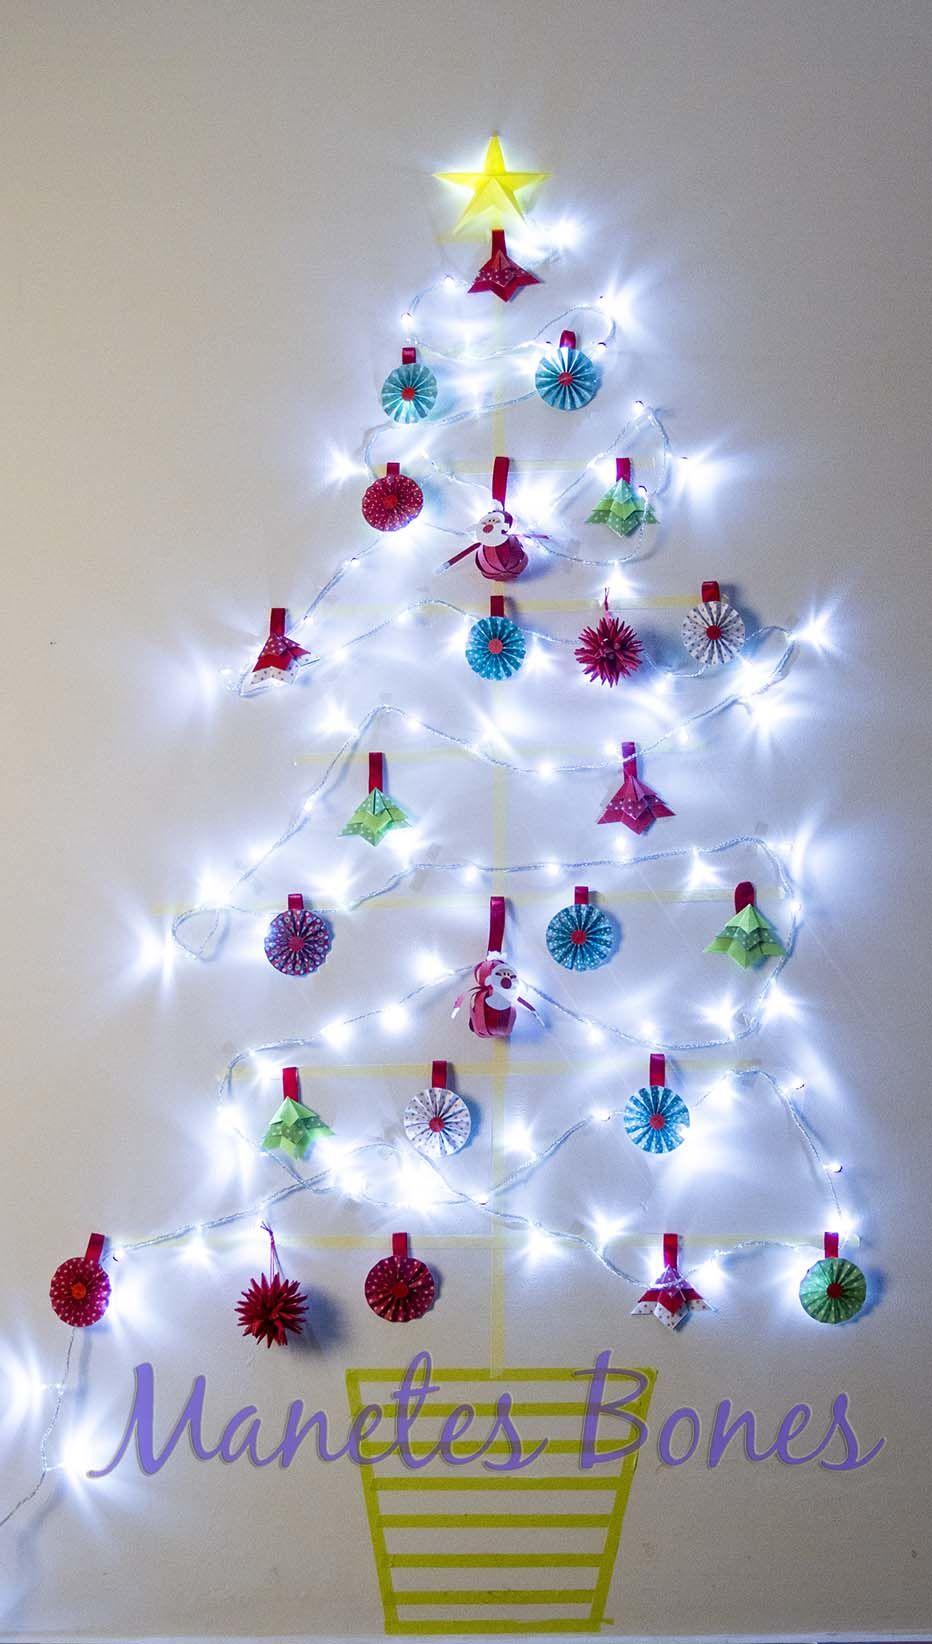 árbol De Navidad De Pared Con Washi Tape Christmas Bulbs Christmas Ornaments Christmas